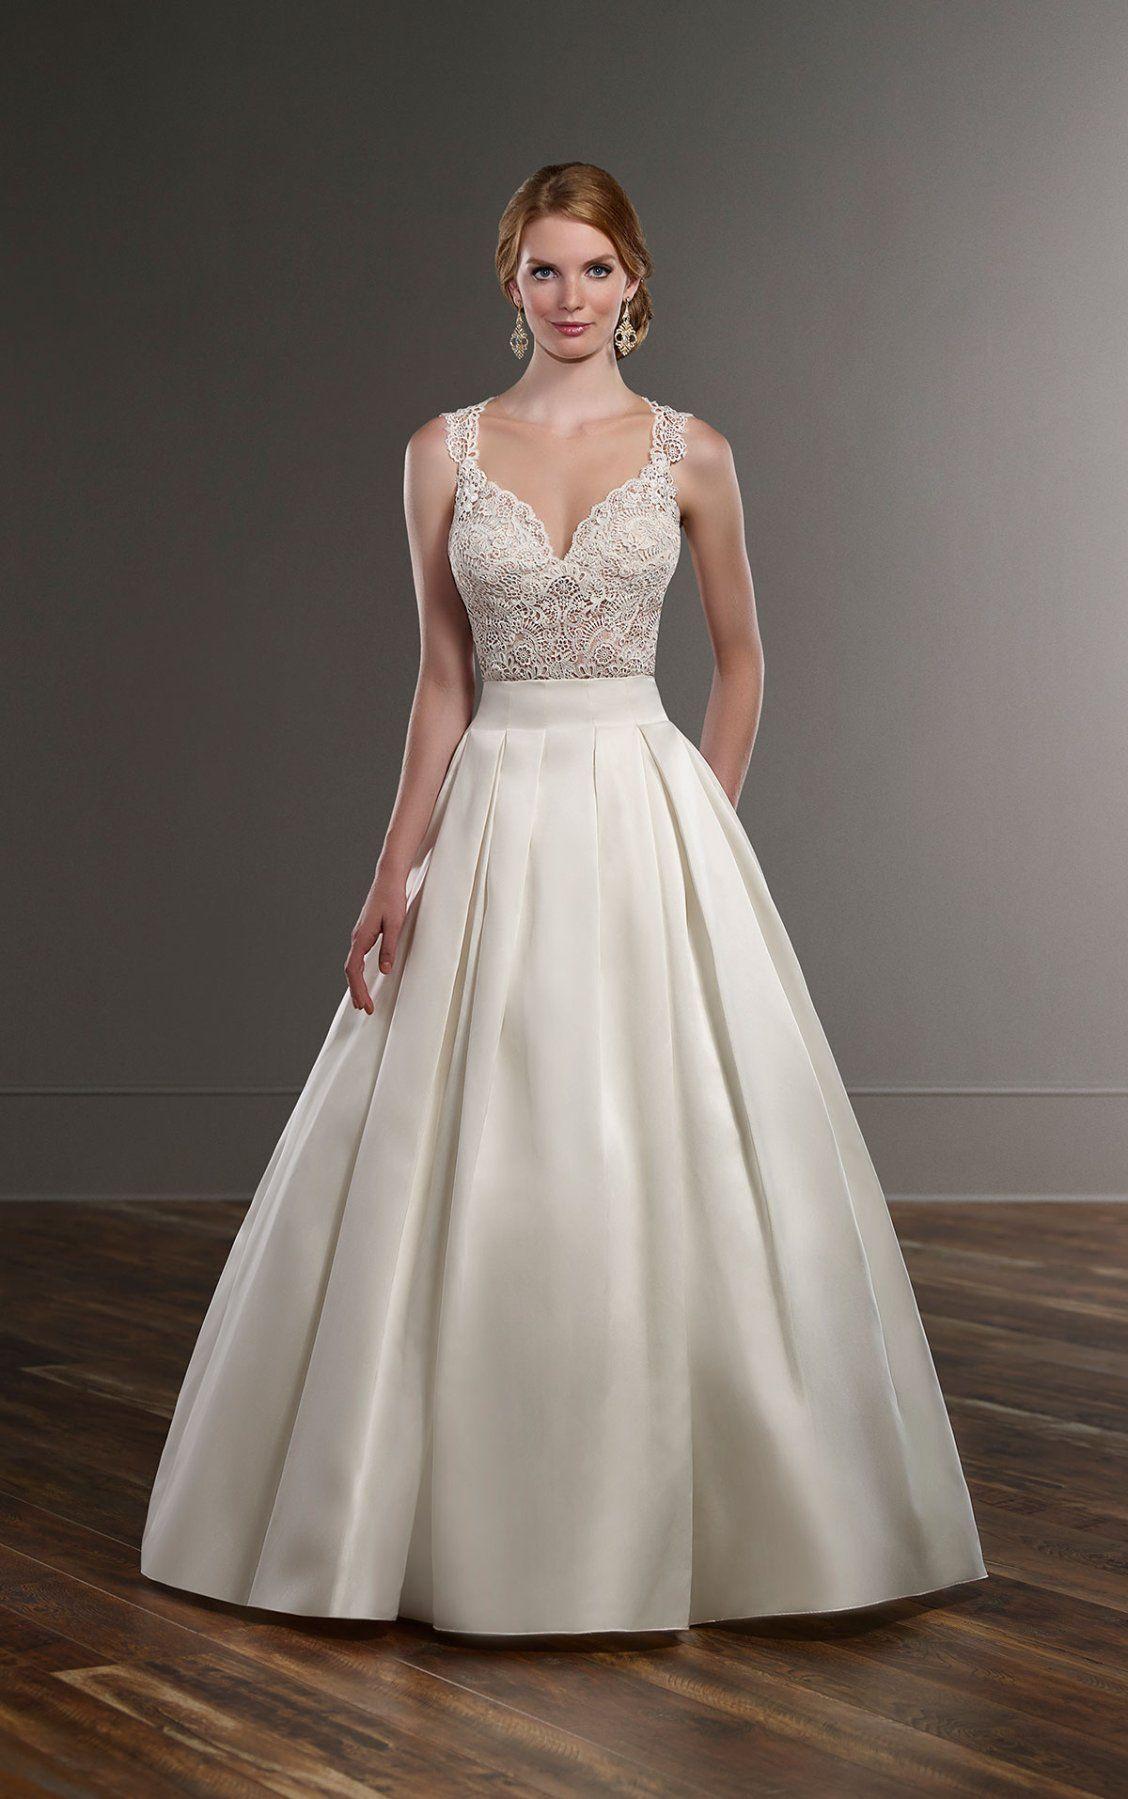 Traditional wedding dress separates martina liana separates